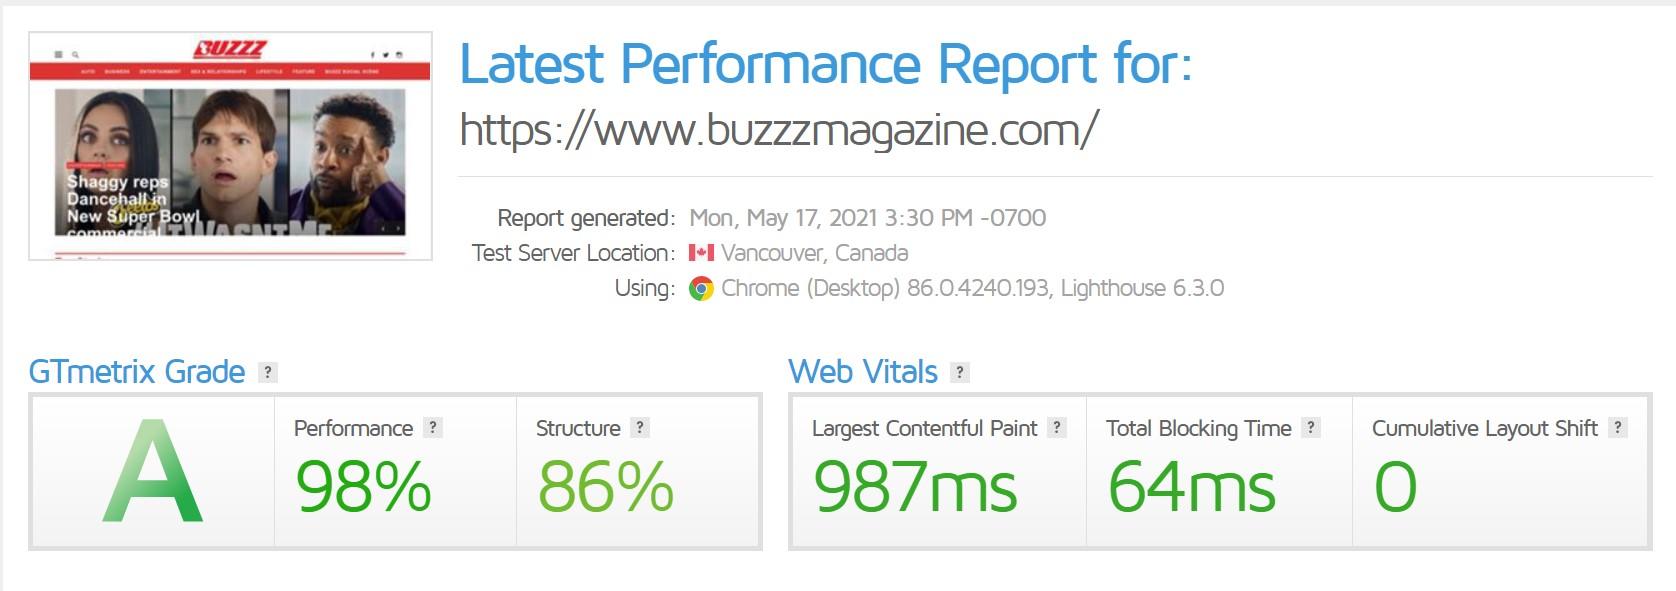 Buzzz's GT Metrix Score for Vancouver, Canada